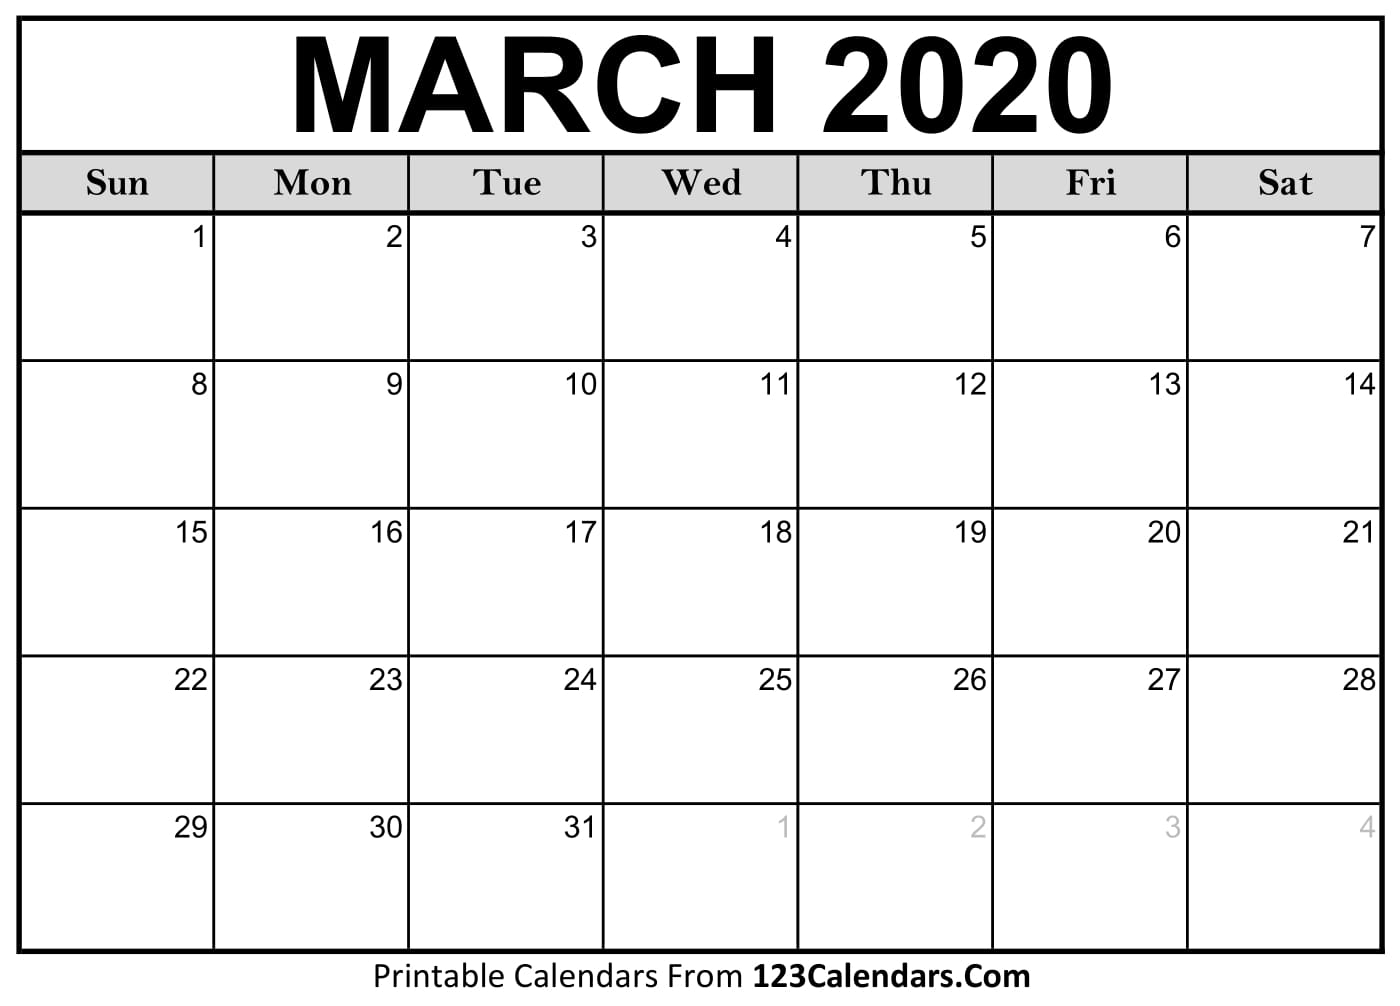 March 2020 Printable Calendar   123Calendars